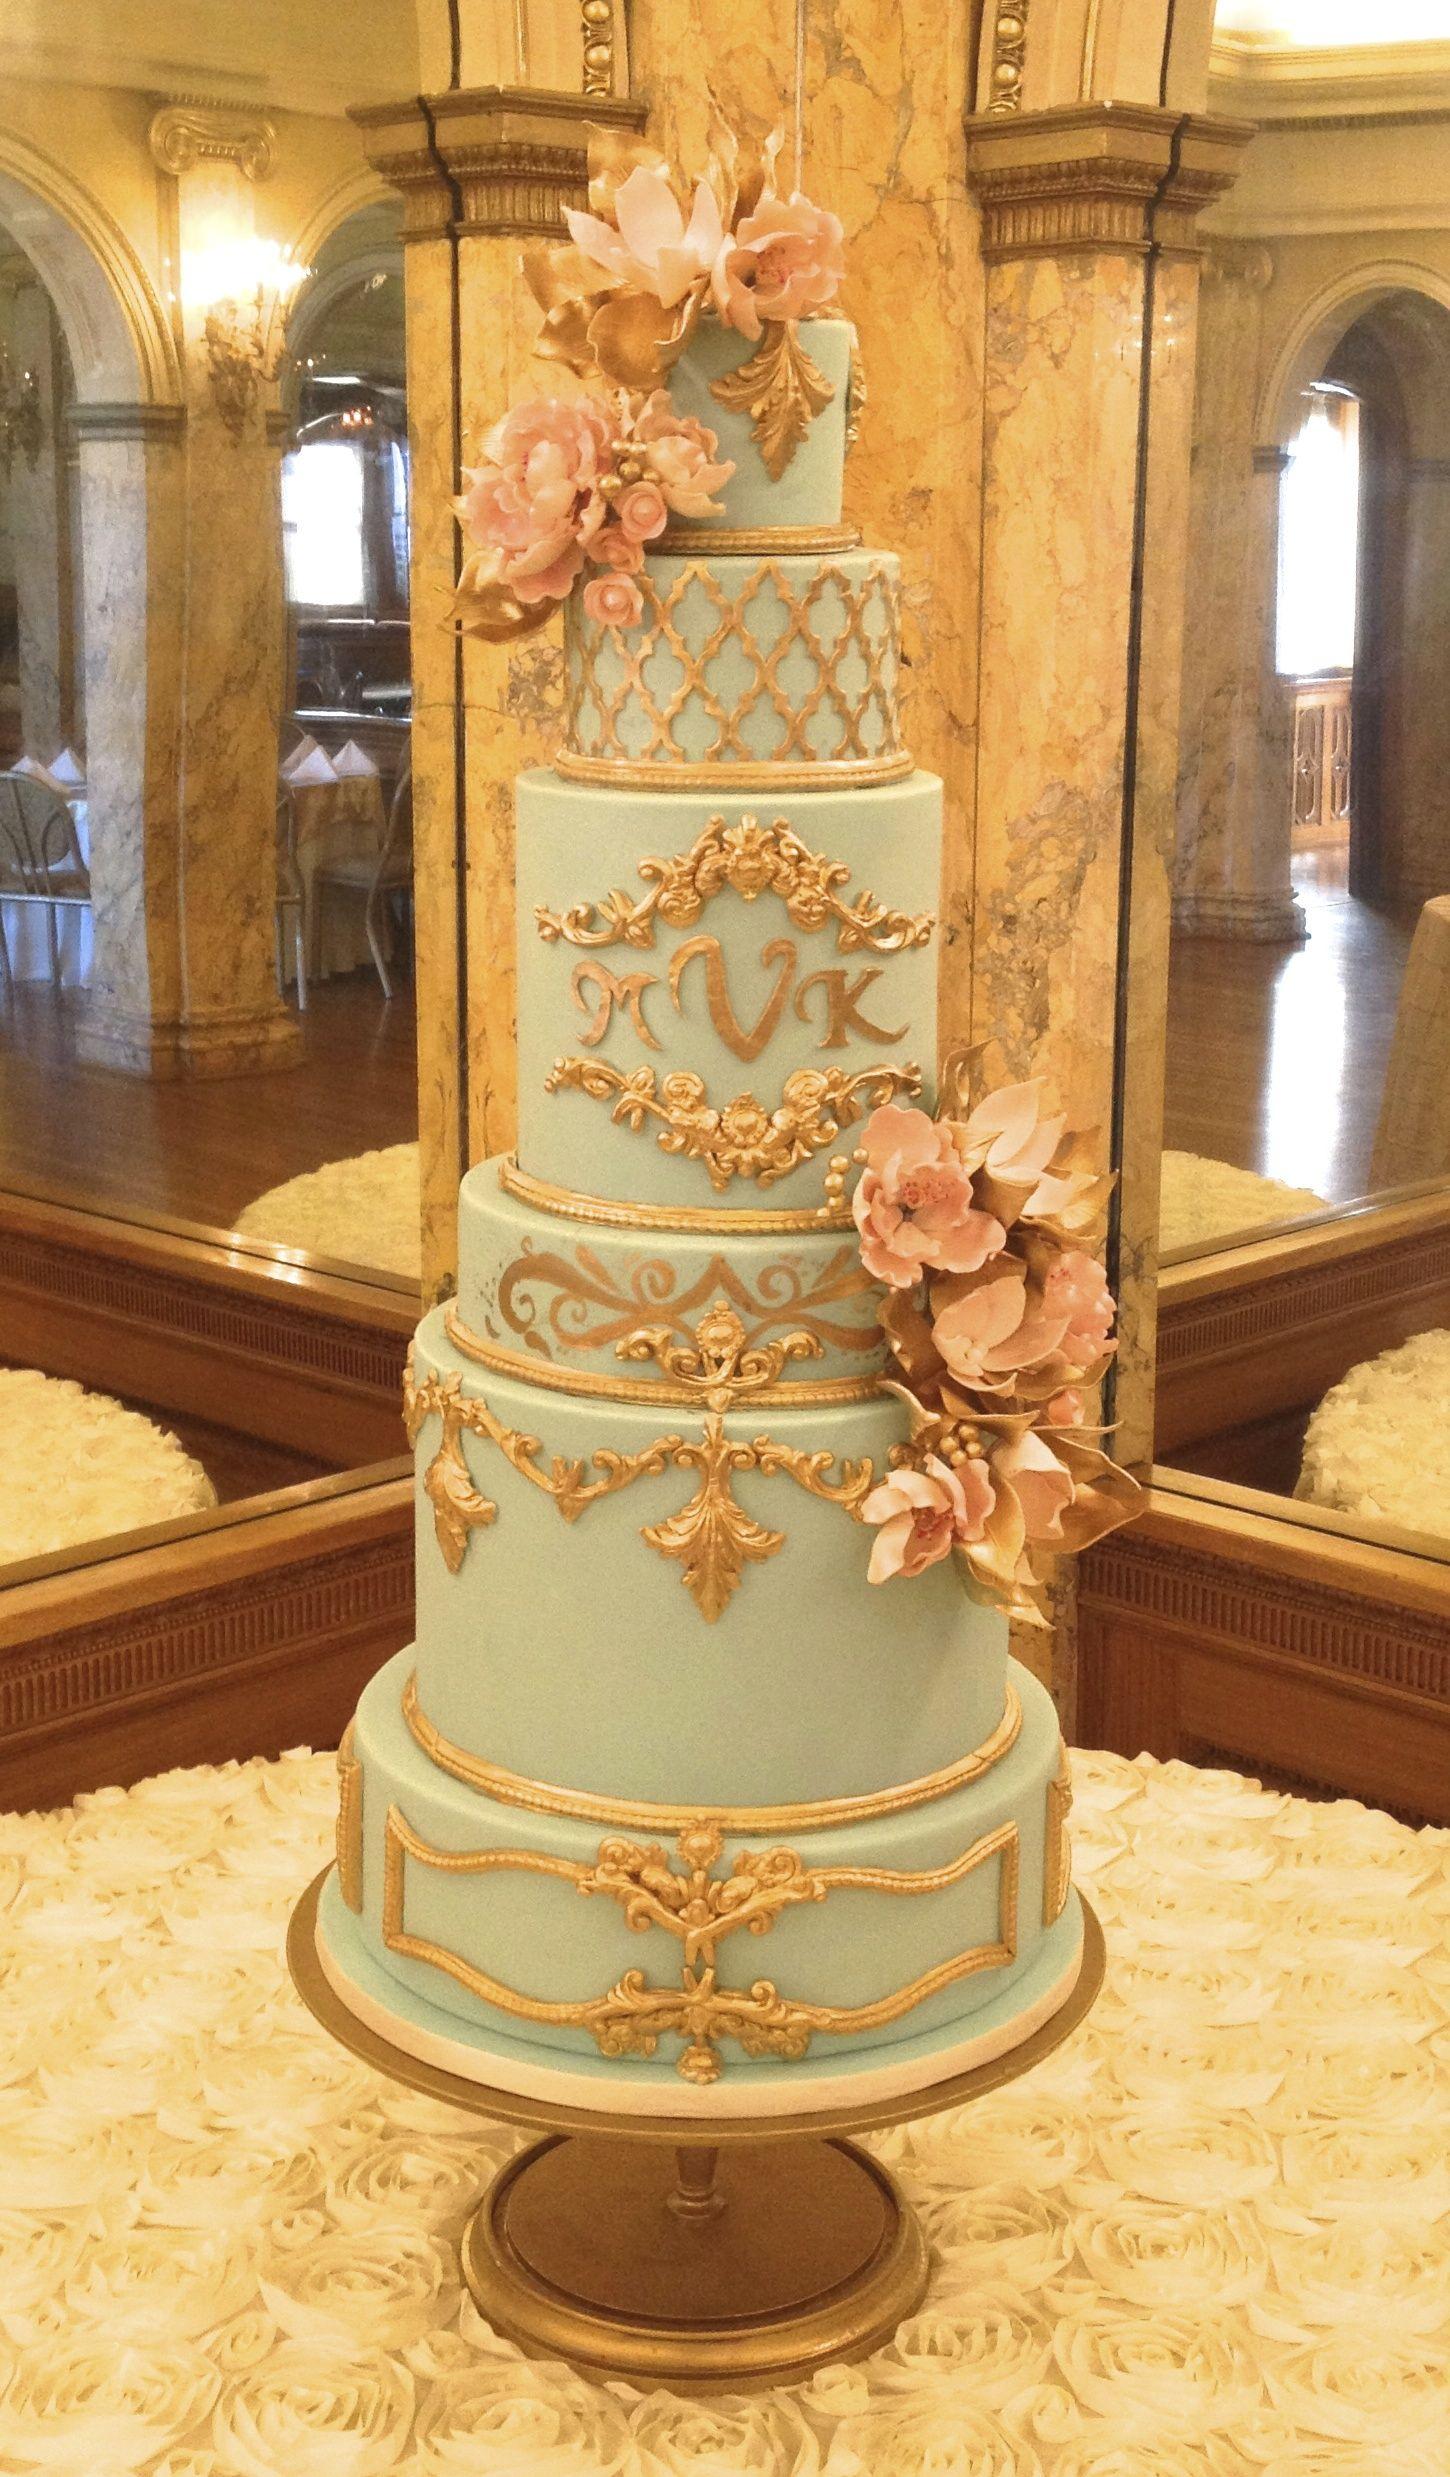 Utah Wedding Cakes | Amazing Wedding Cakes | Gallery | A Piece of ...